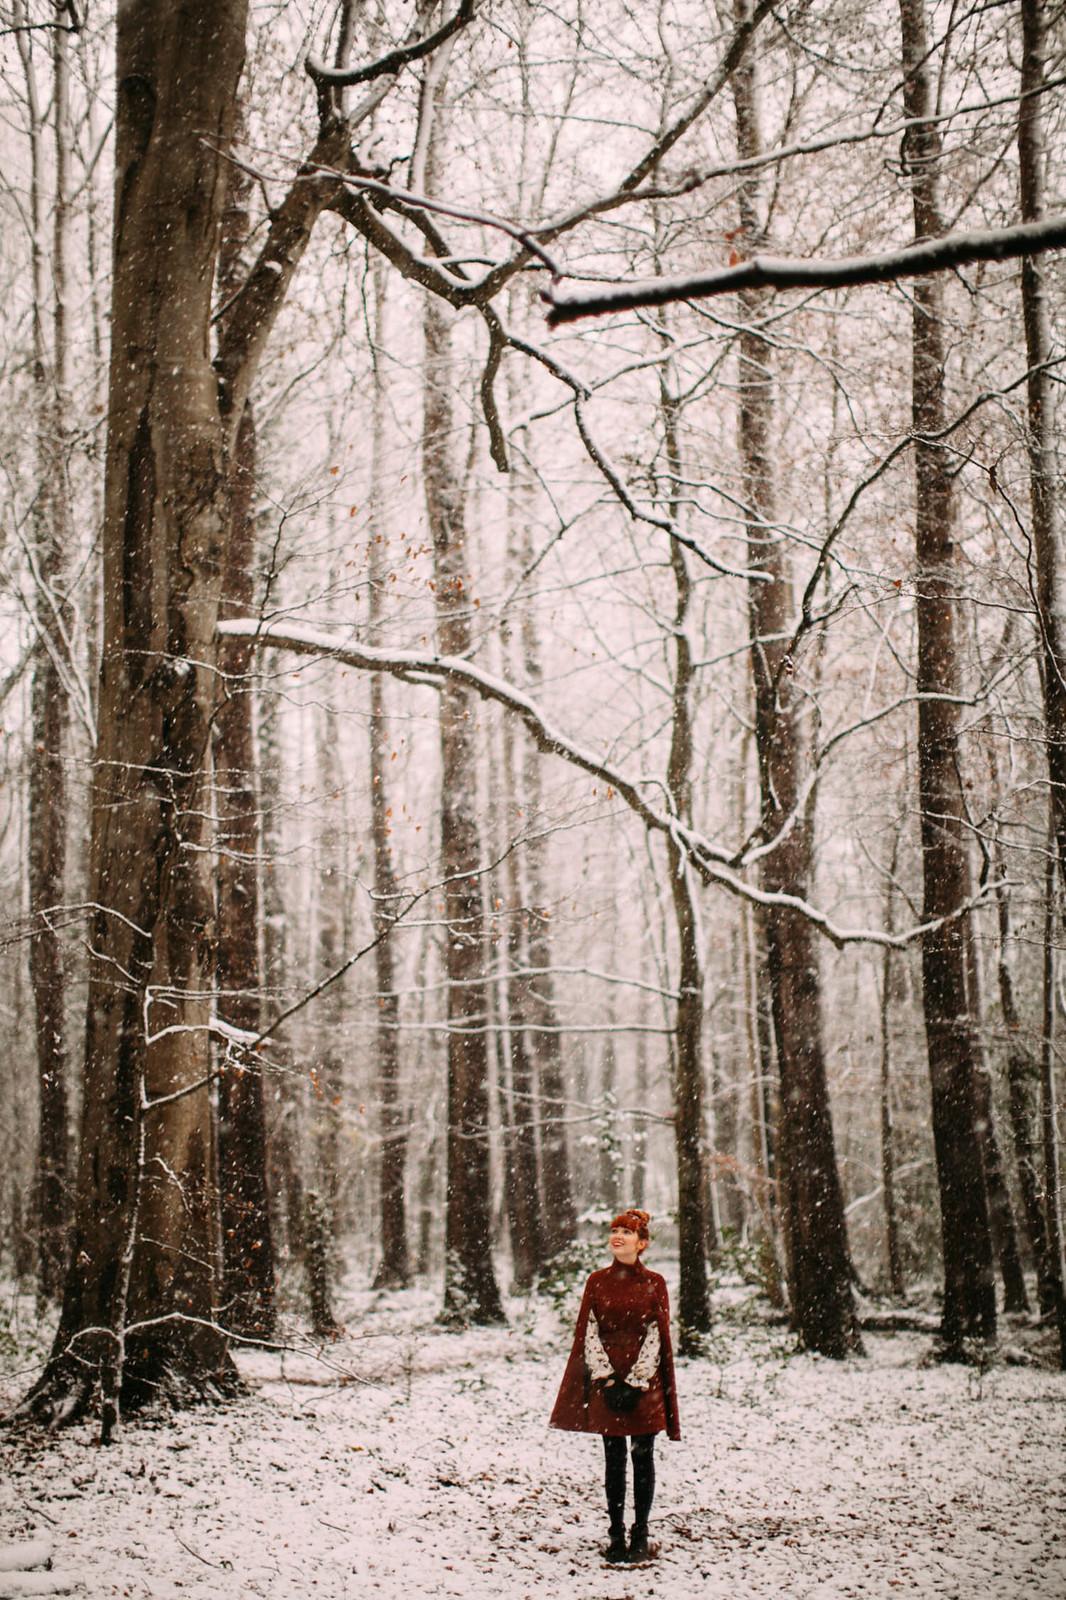 aclotheshorse snow day cape let it snow